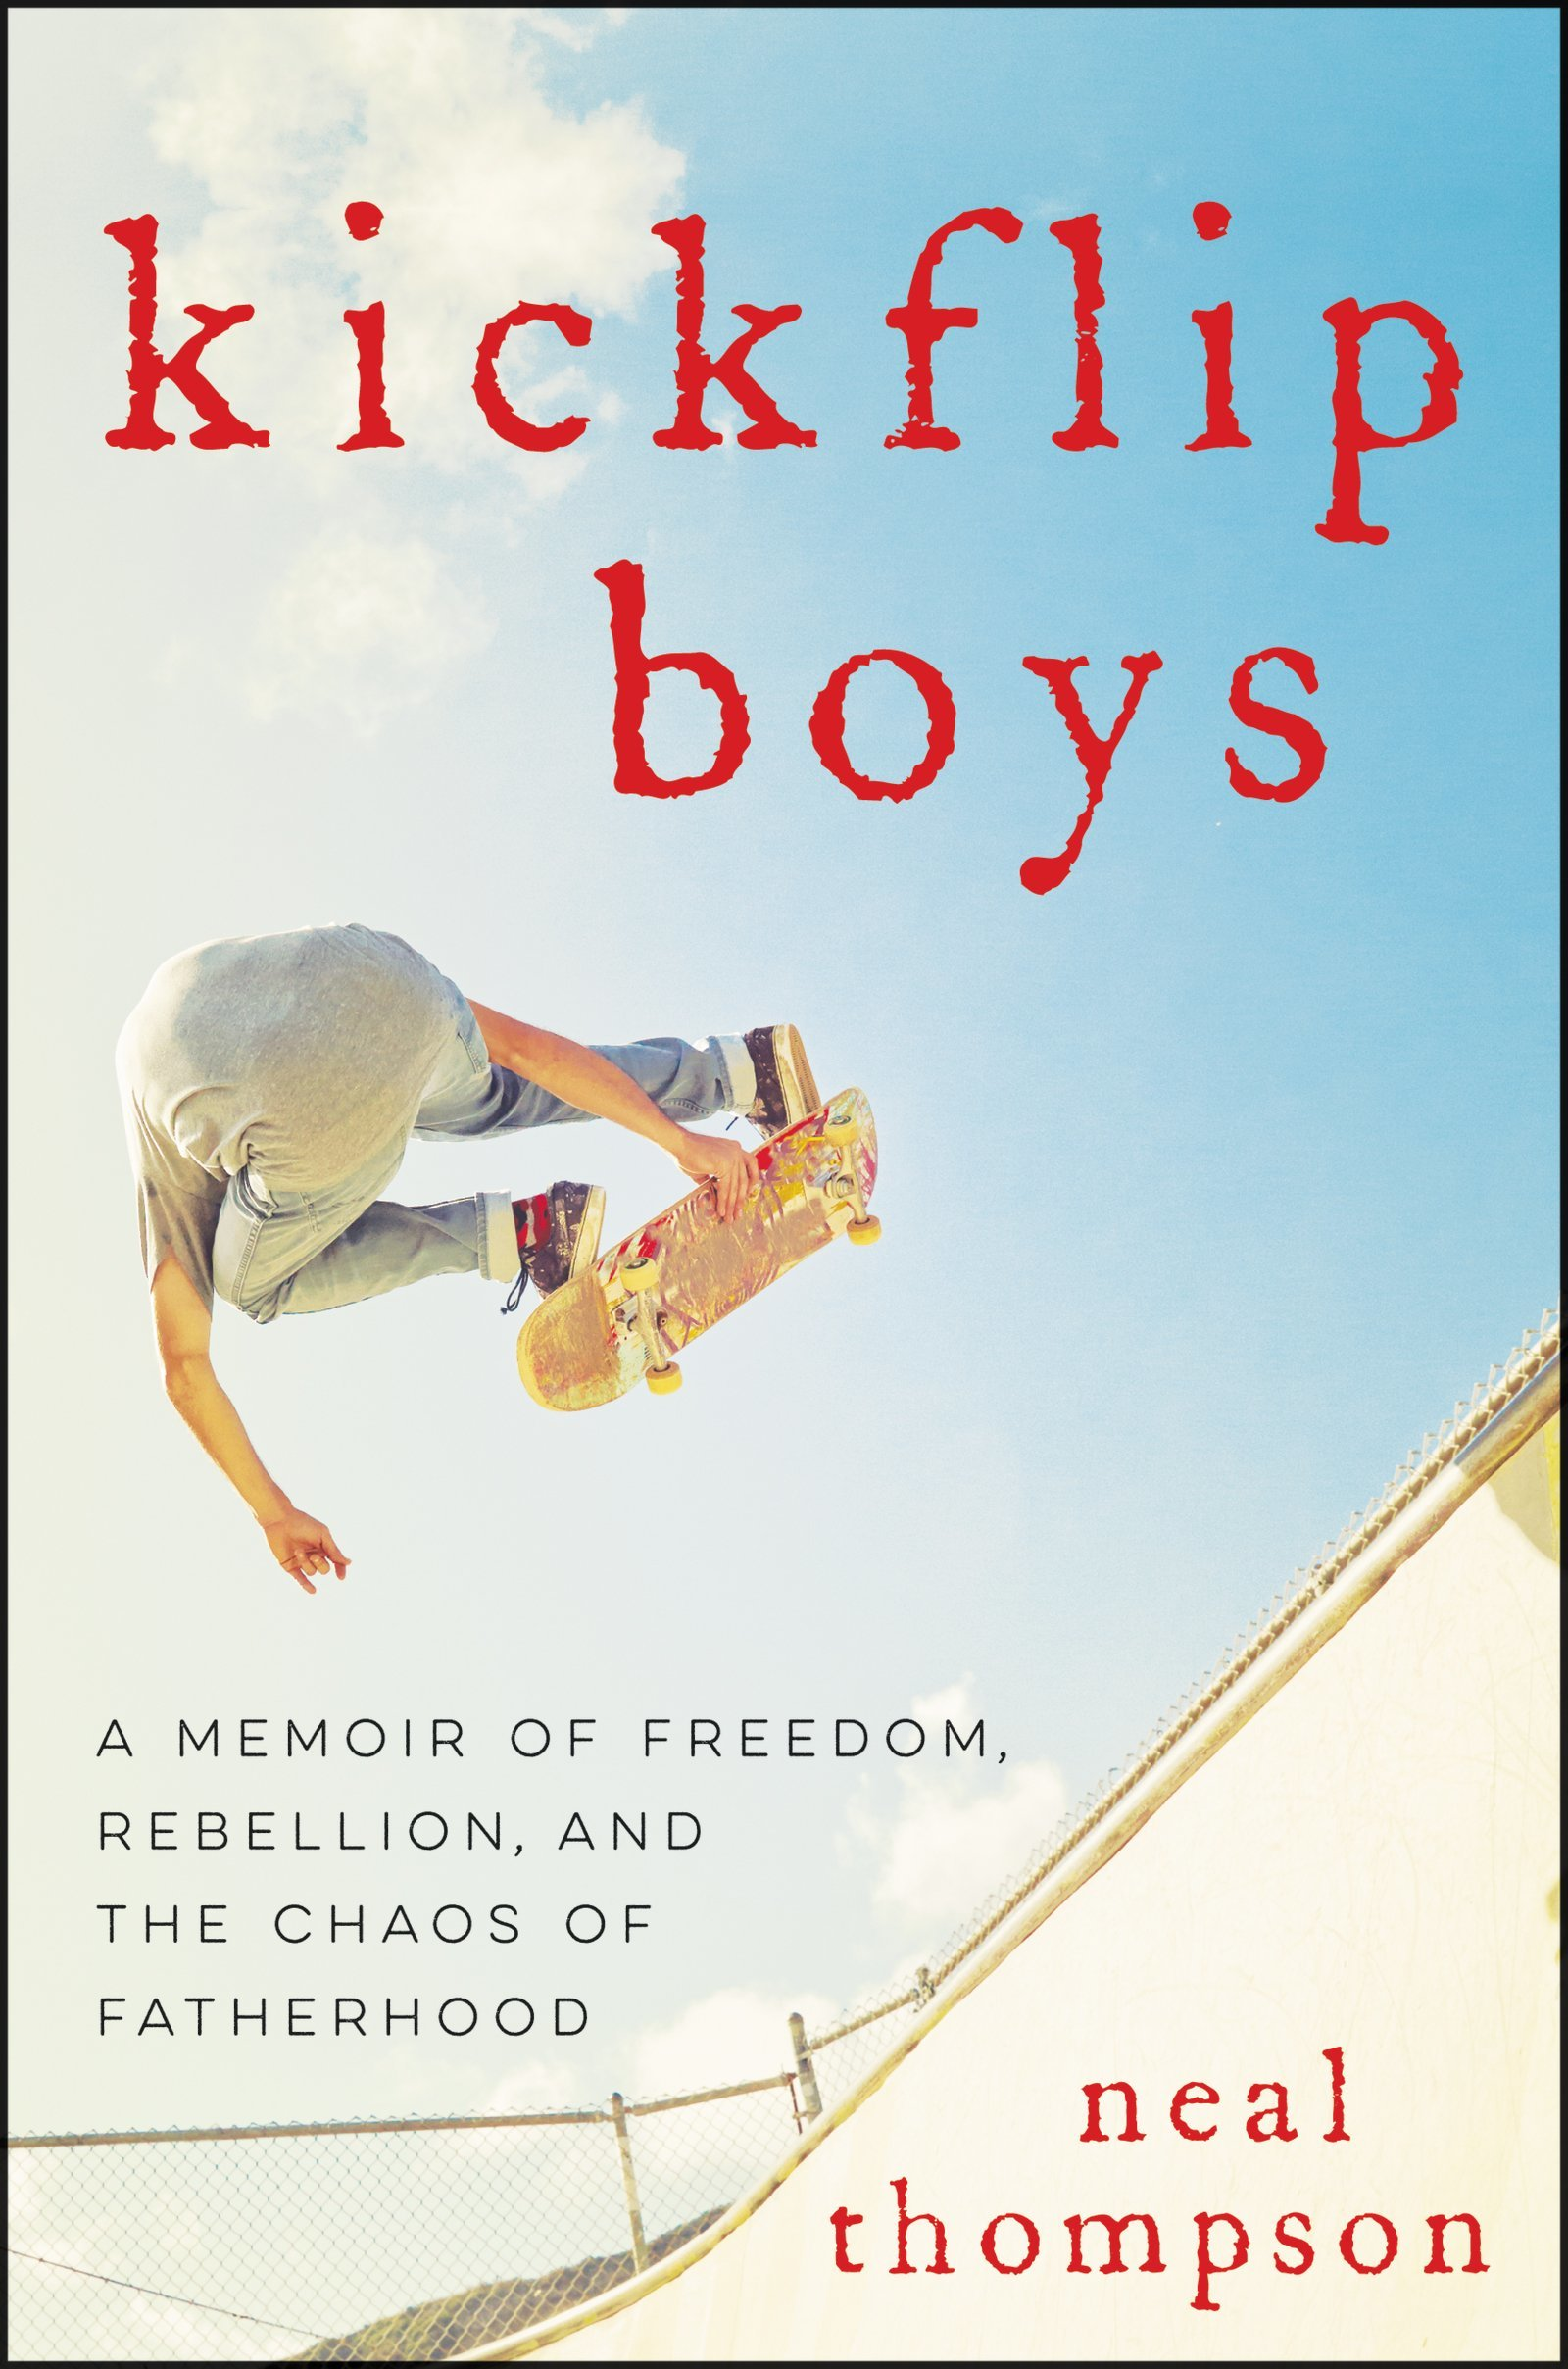 Kickflip Boys A Memoir of Freedom, Rebellion, and the Chaos of Fatherhood